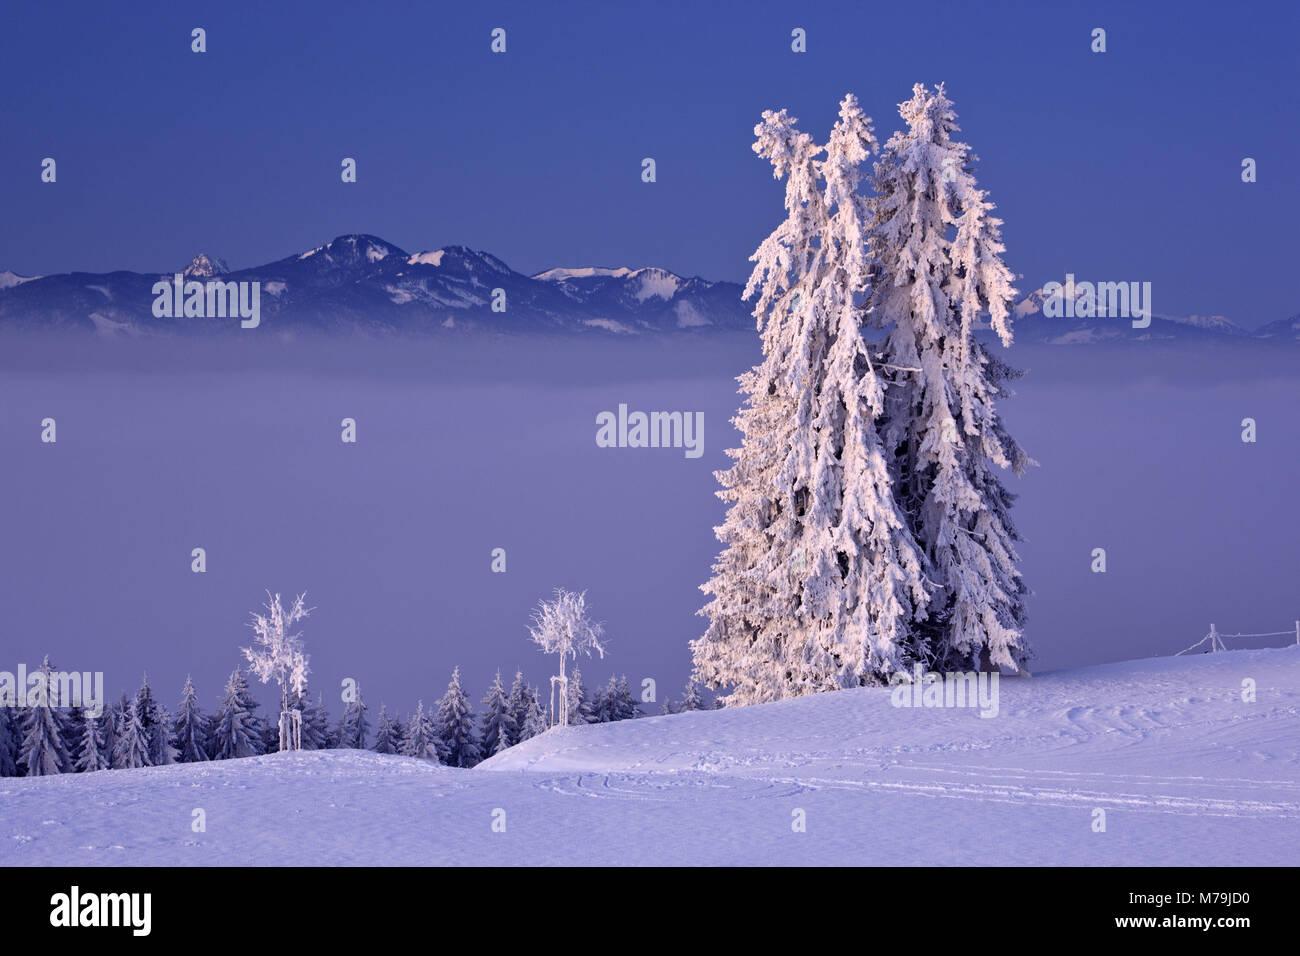 Germany, Bavaria, Allgäu, east Allgäu, Königswinkel, Auerberg, winter scenery, Sorgschrofen, Grünten, Stock Photo